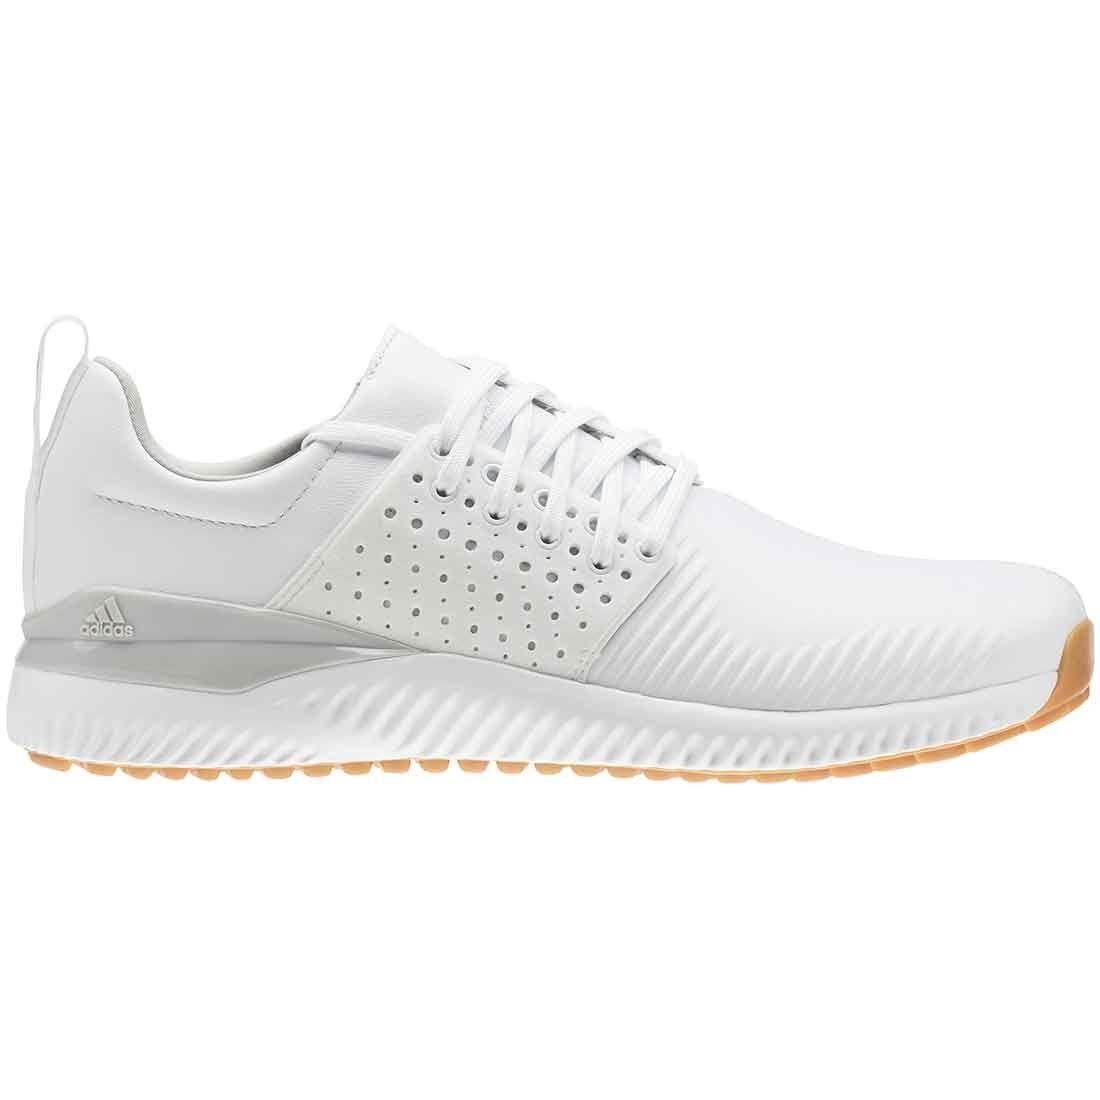 Buy Adidas Adicross Bounce Golf Shoes Cloud White Golf Discount